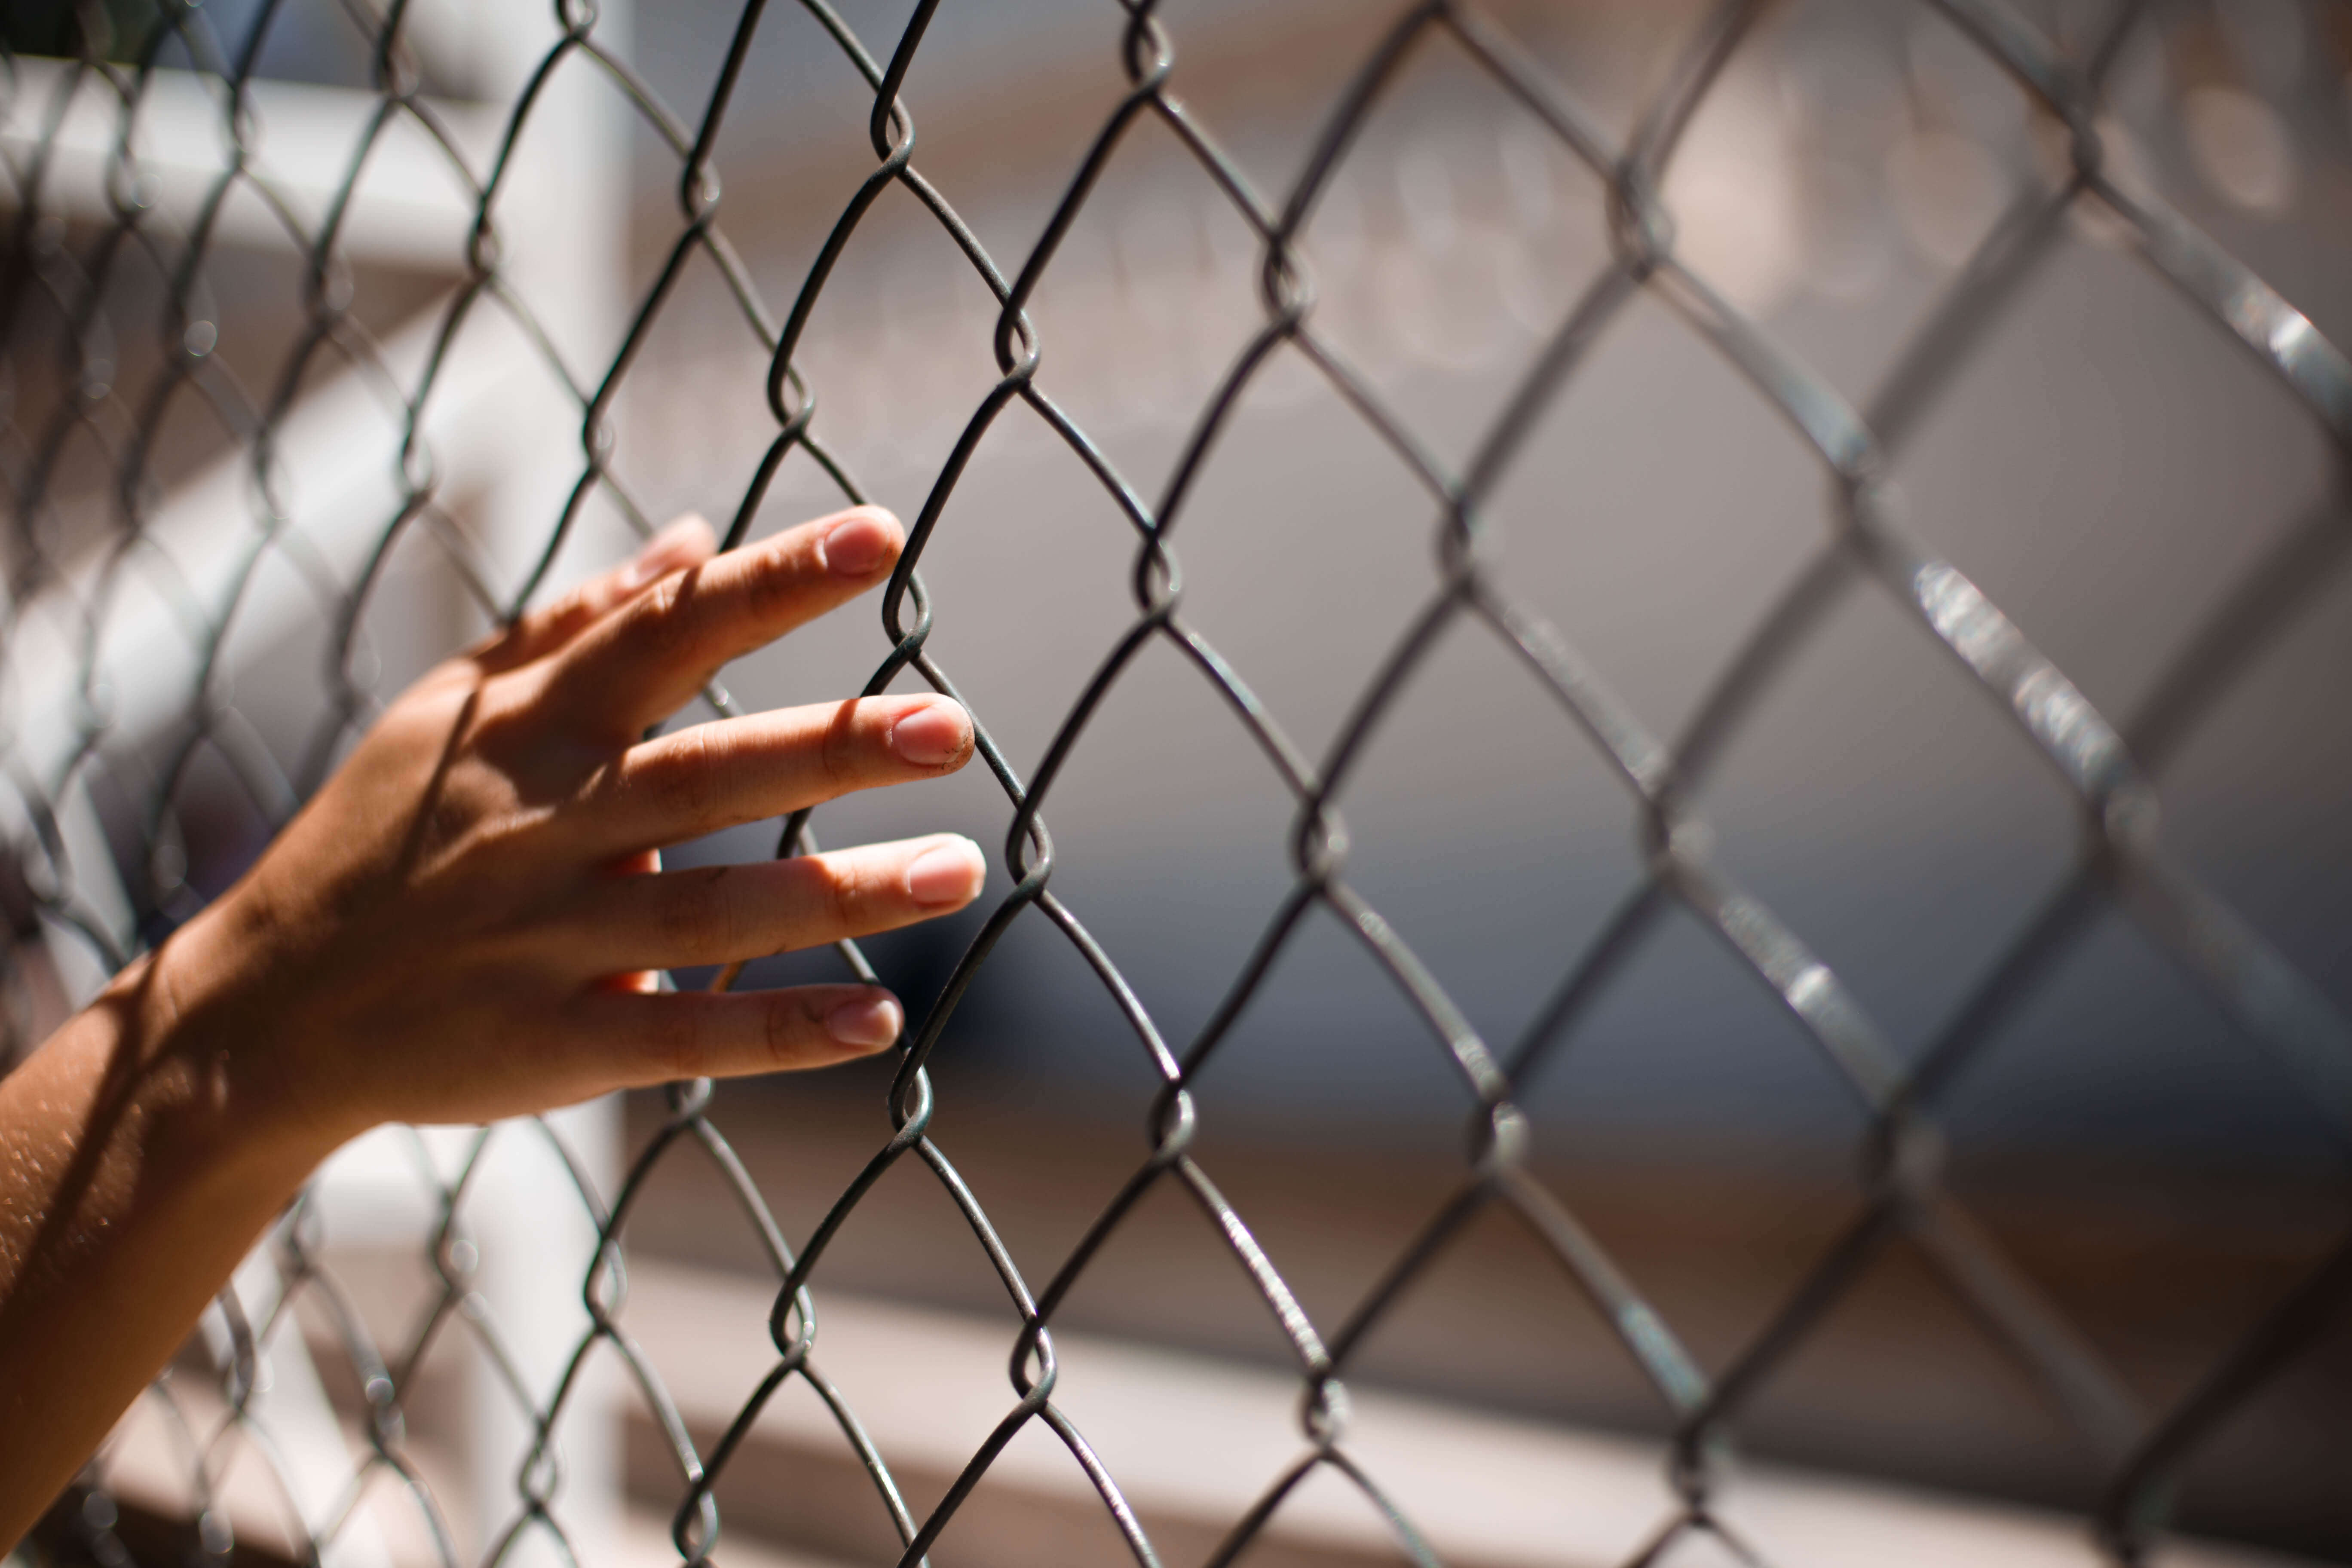 Prison Valley: Look inside Prison Town